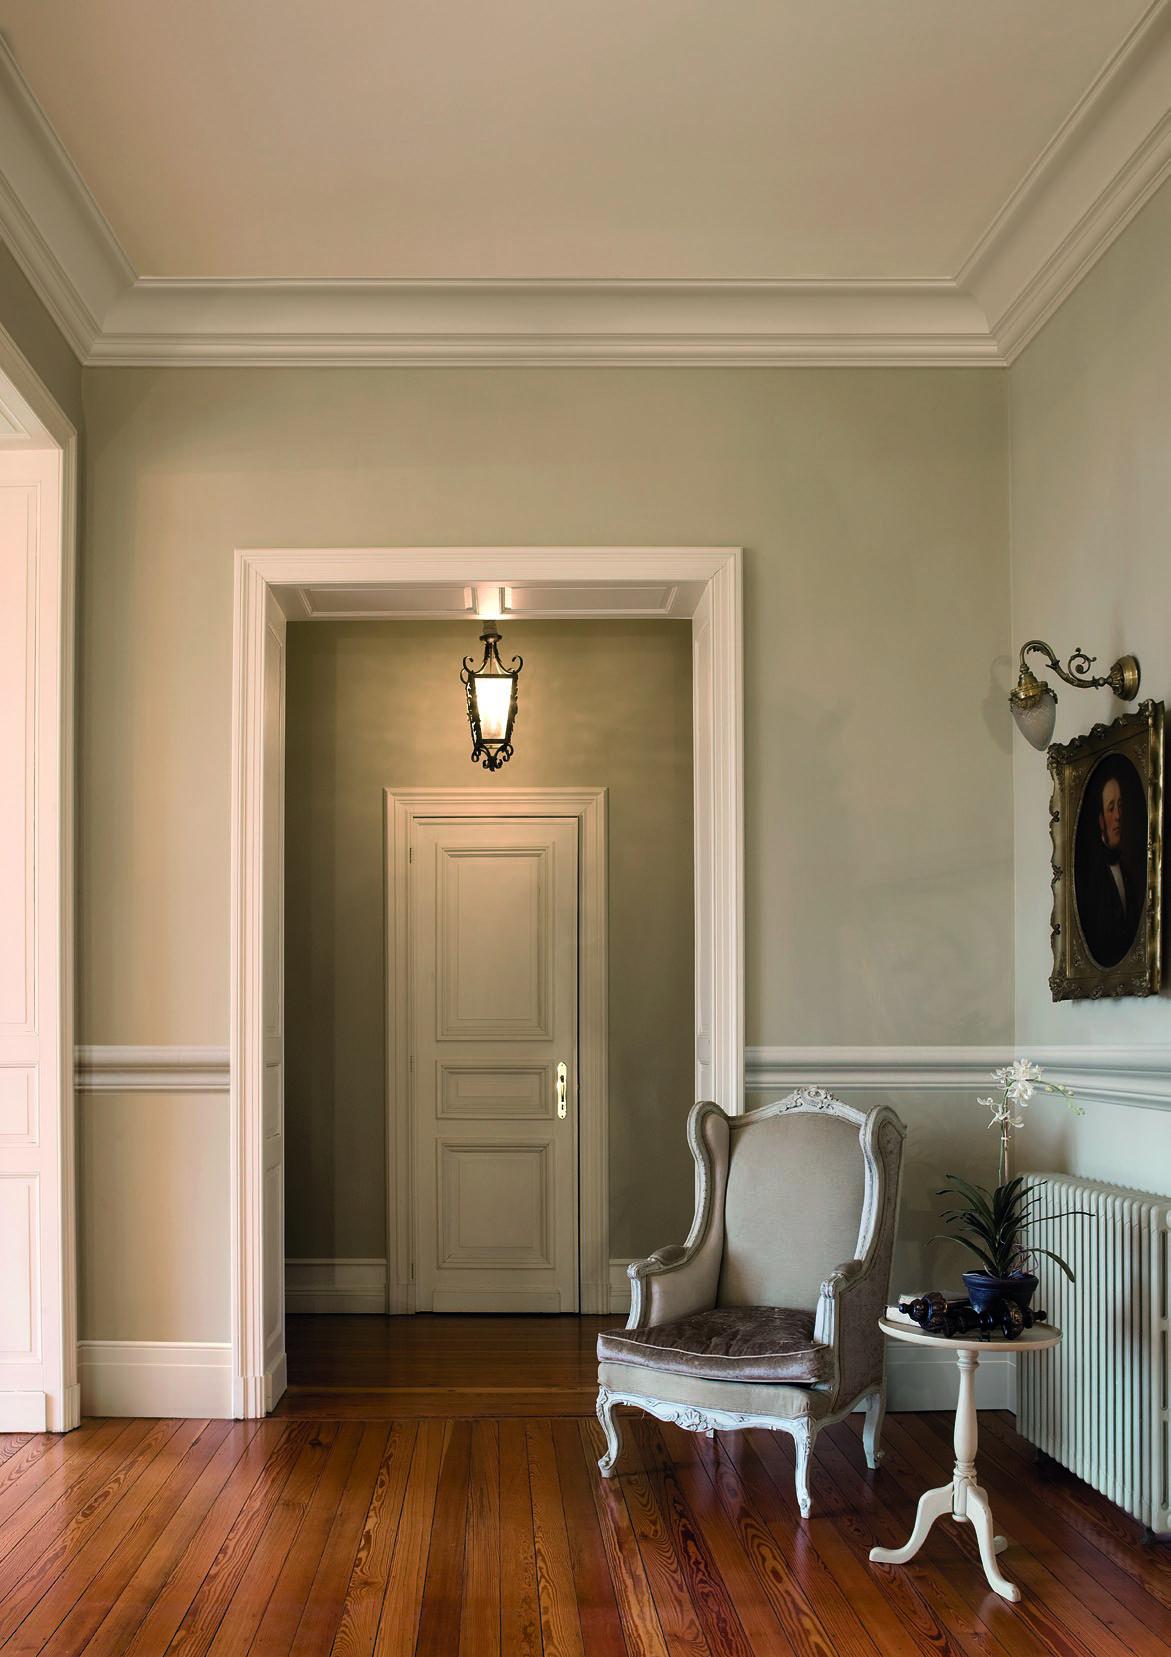 Плинтуса на потолке в интерьере в стиле классика